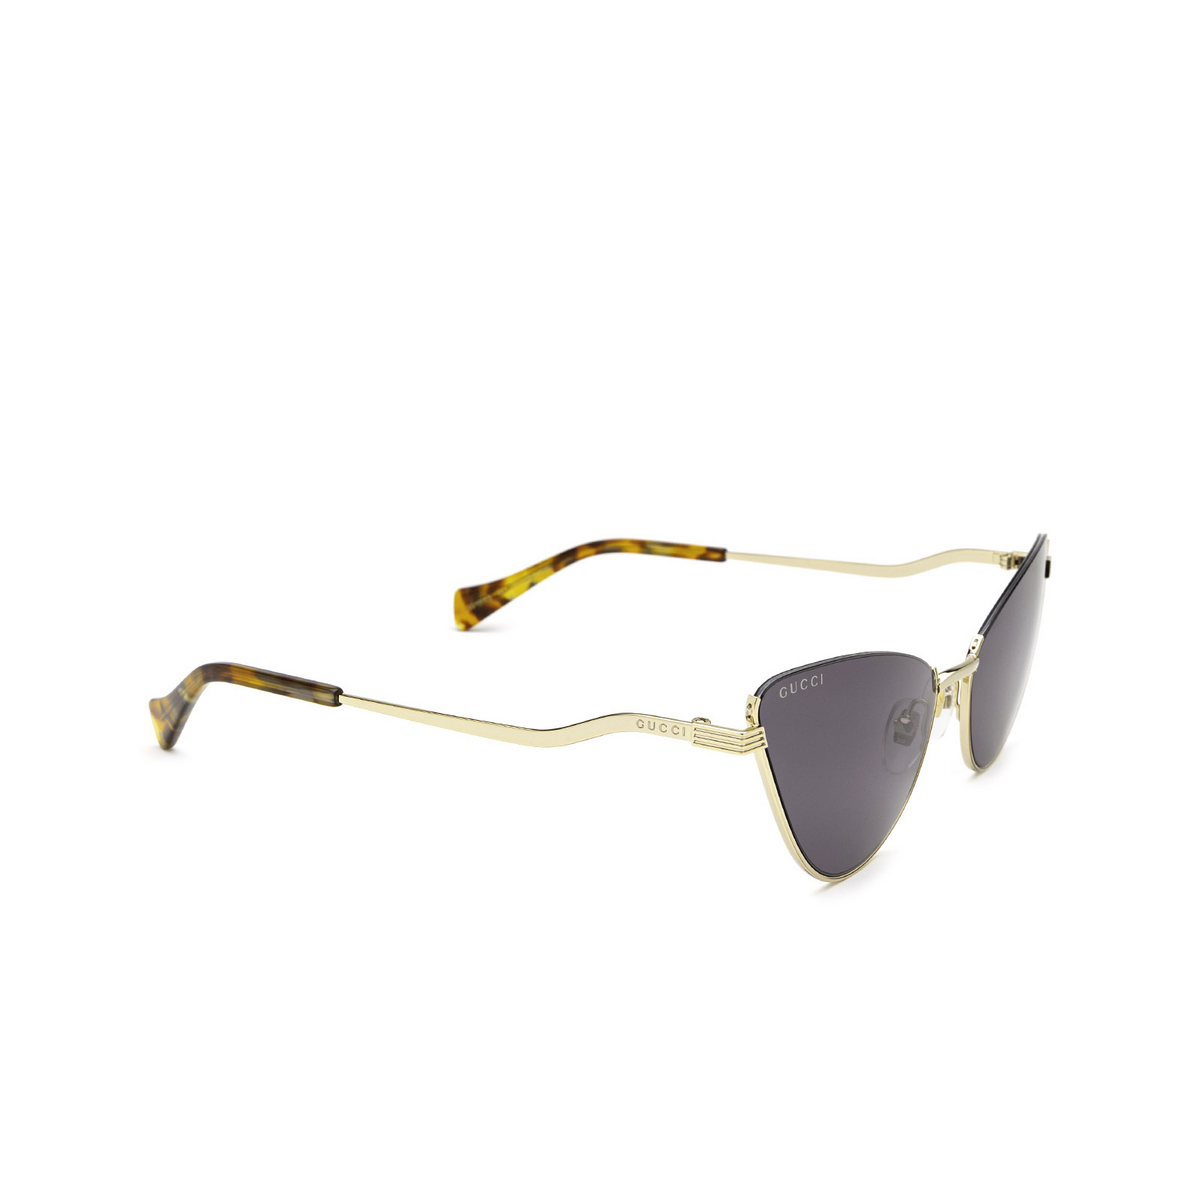 Gucci® Cat-eye Sunglasses: GG1006S color Gold 001 - three-quarters view.